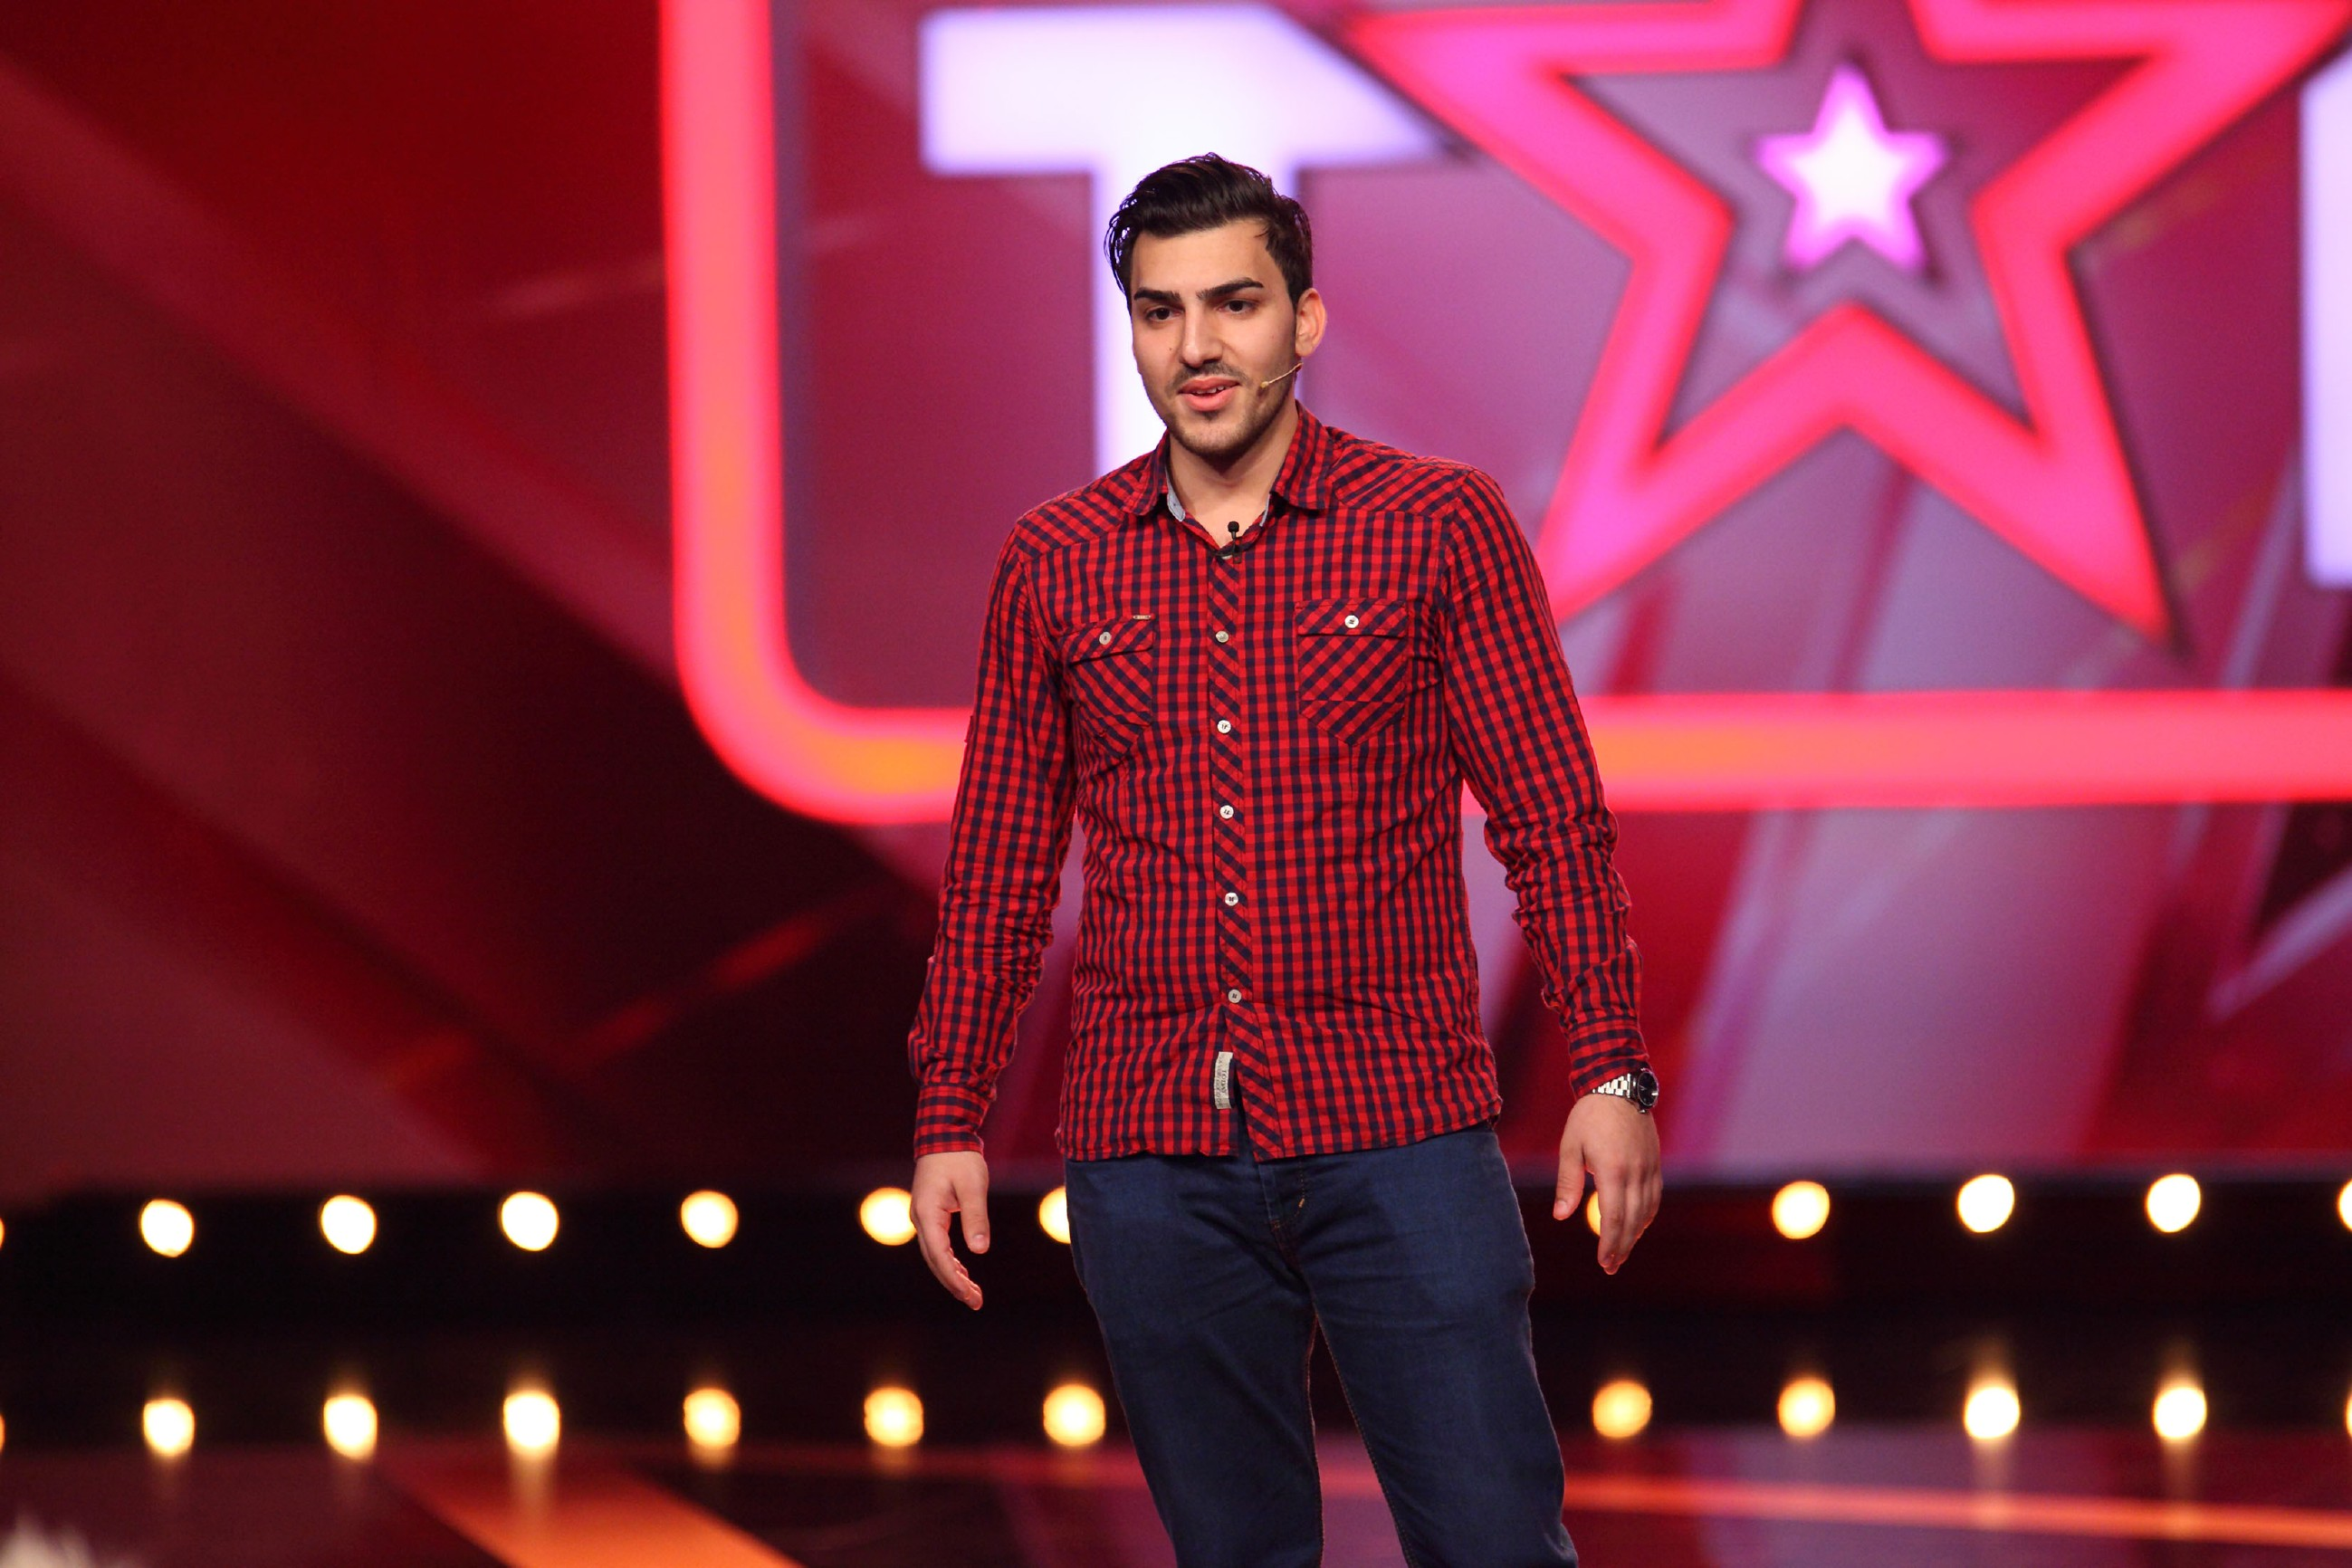 Das Supertalent 2015 Show 5 - Cem Okyay aus Jockgrim